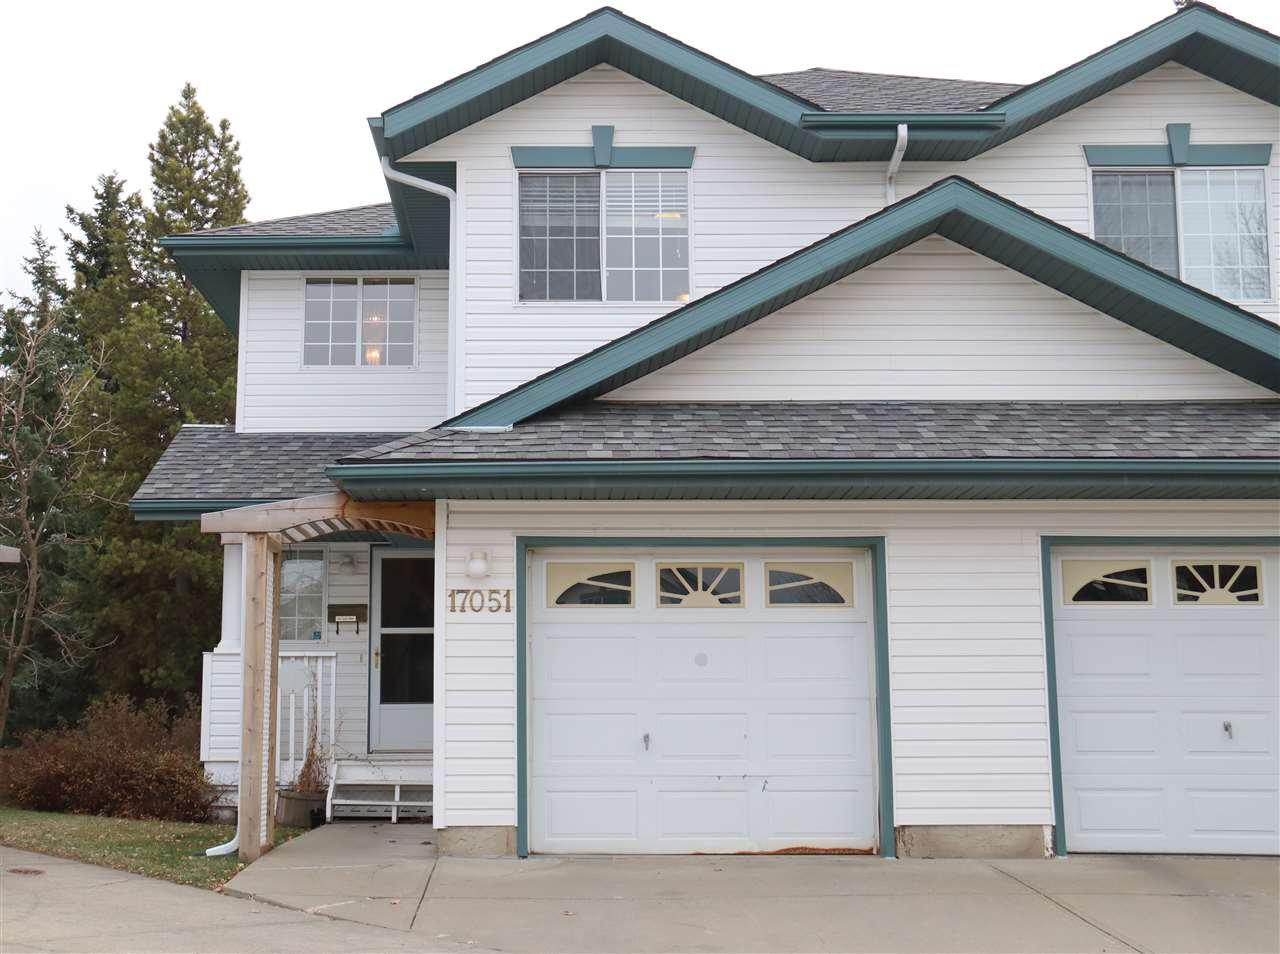 Main Photo: 17051 113 Street in Edmonton: Zone 27 House Half Duplex for sale : MLS®# E4189910